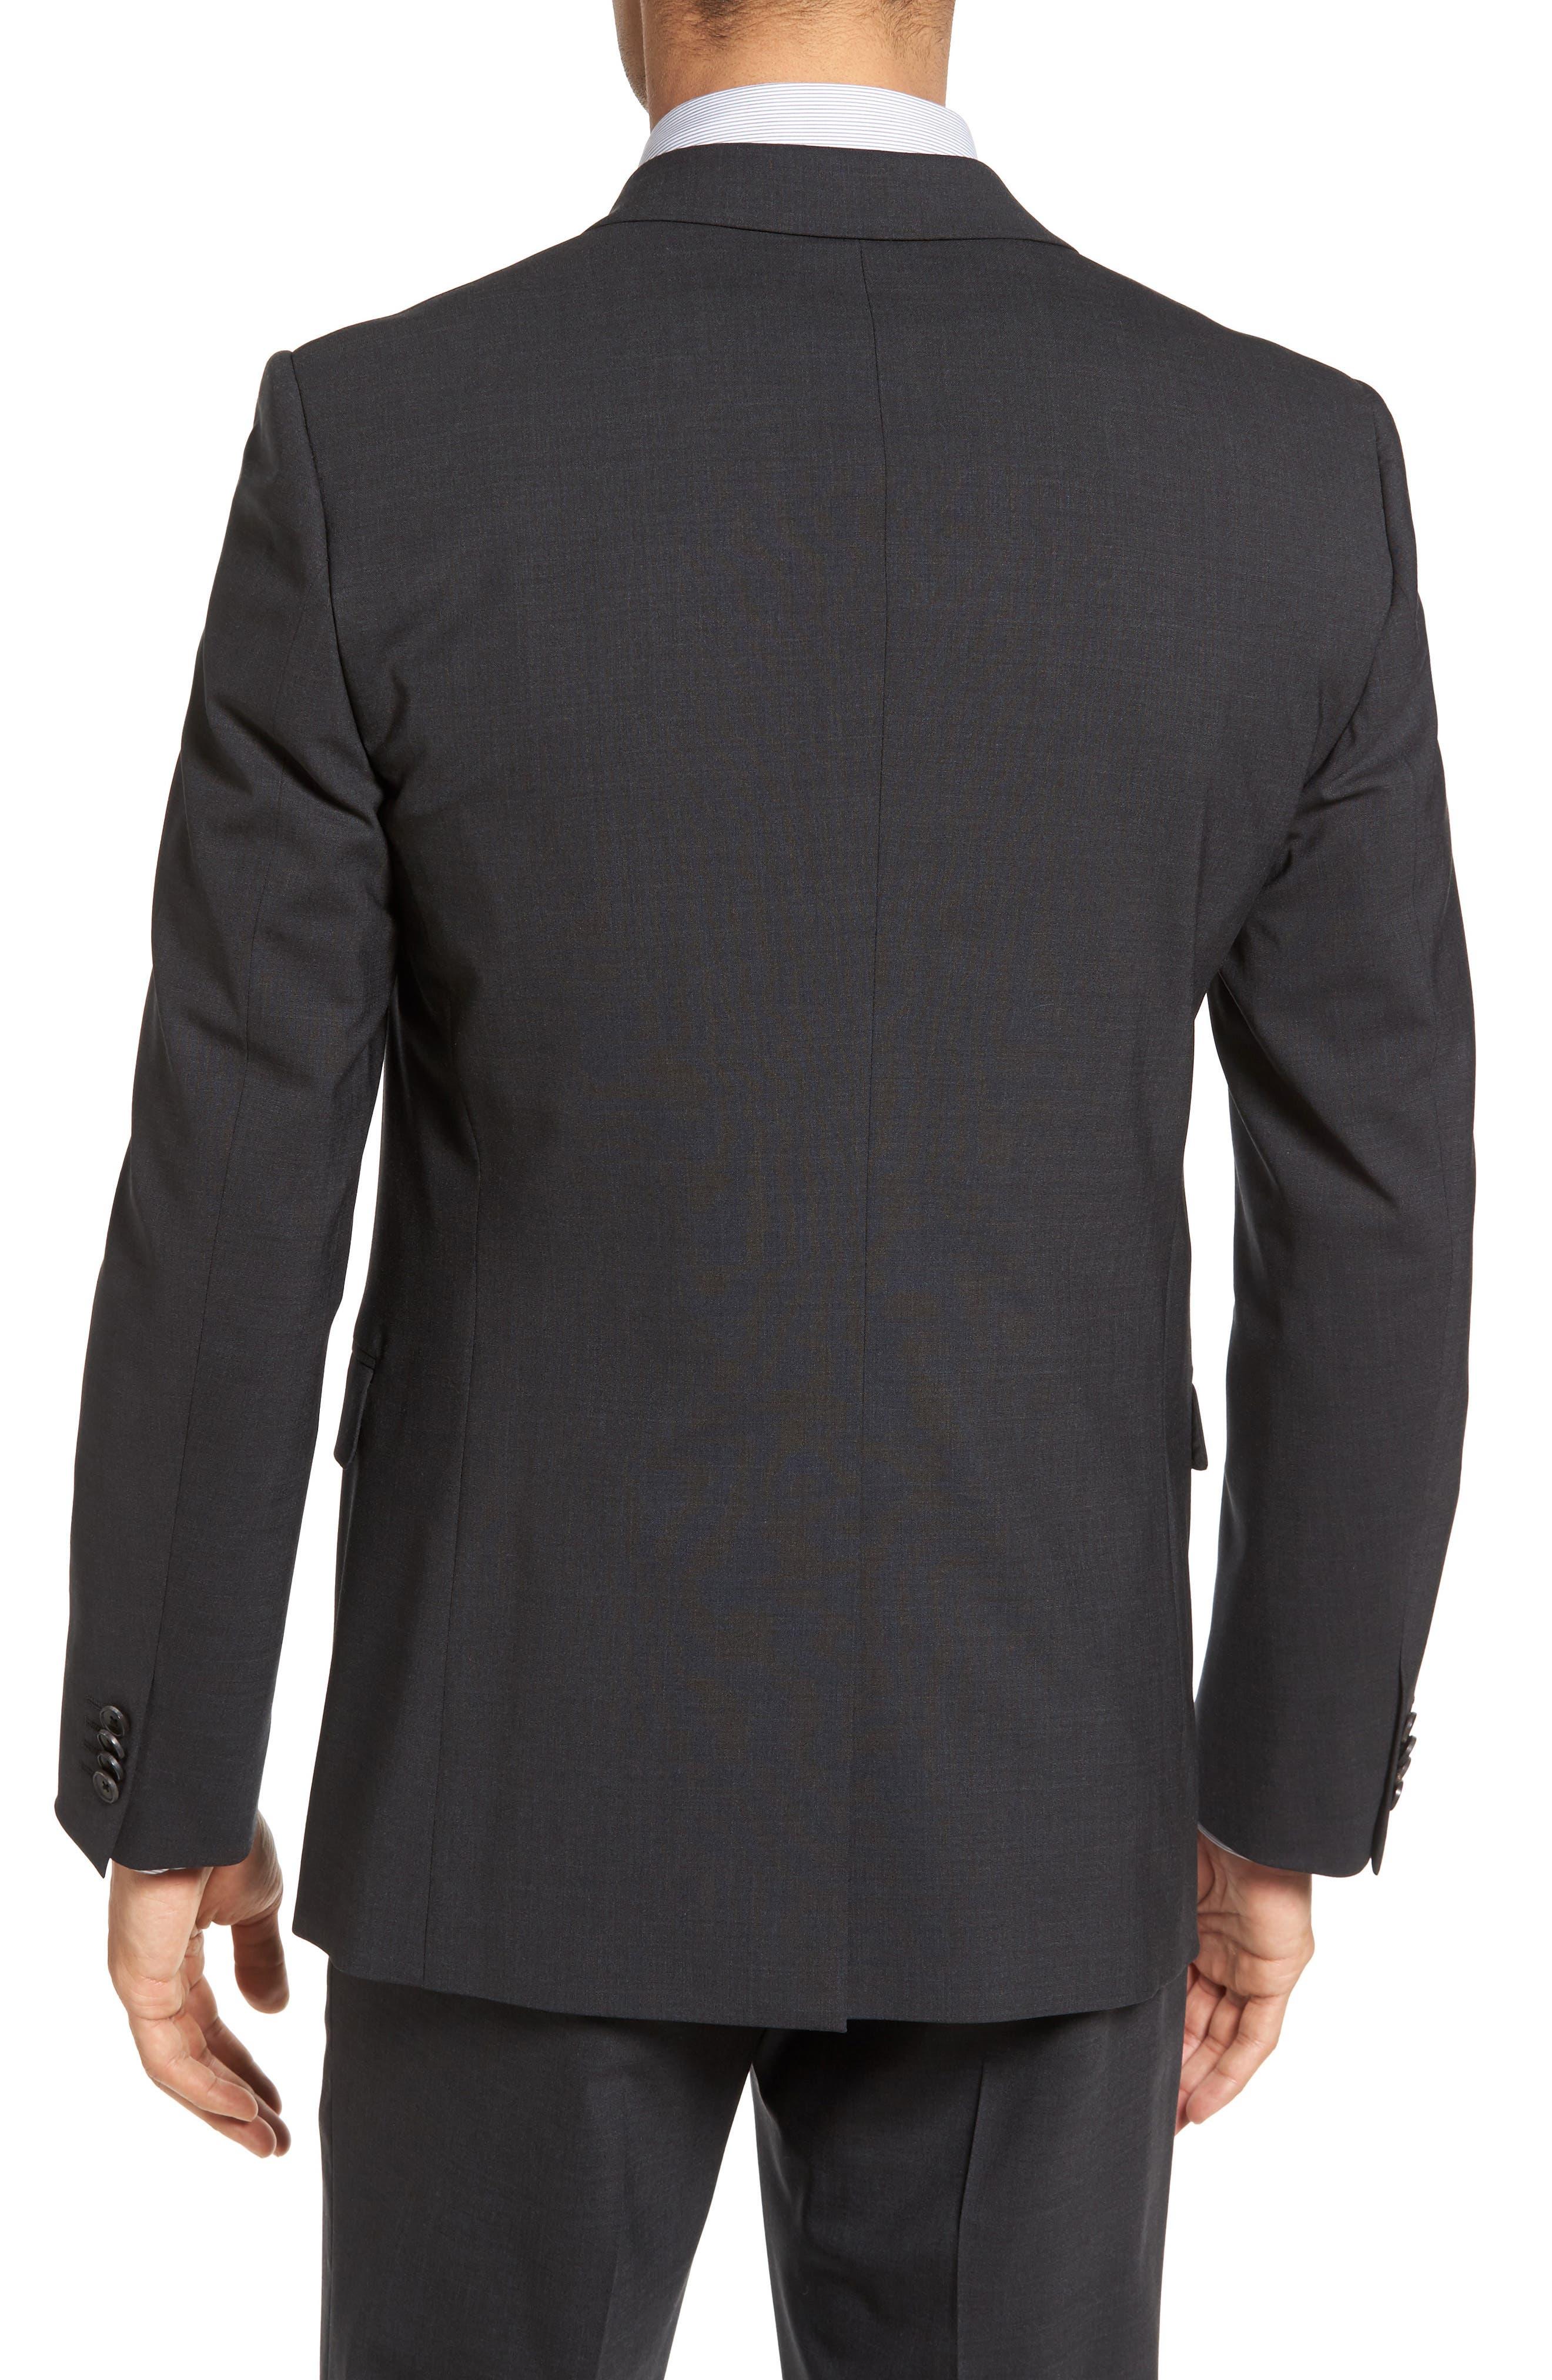 Wellar New Tailor 1 Trim Fit Stretch Wool Sport Coat,                             Alternate thumbnail 2, color,                             Dark Charcoal